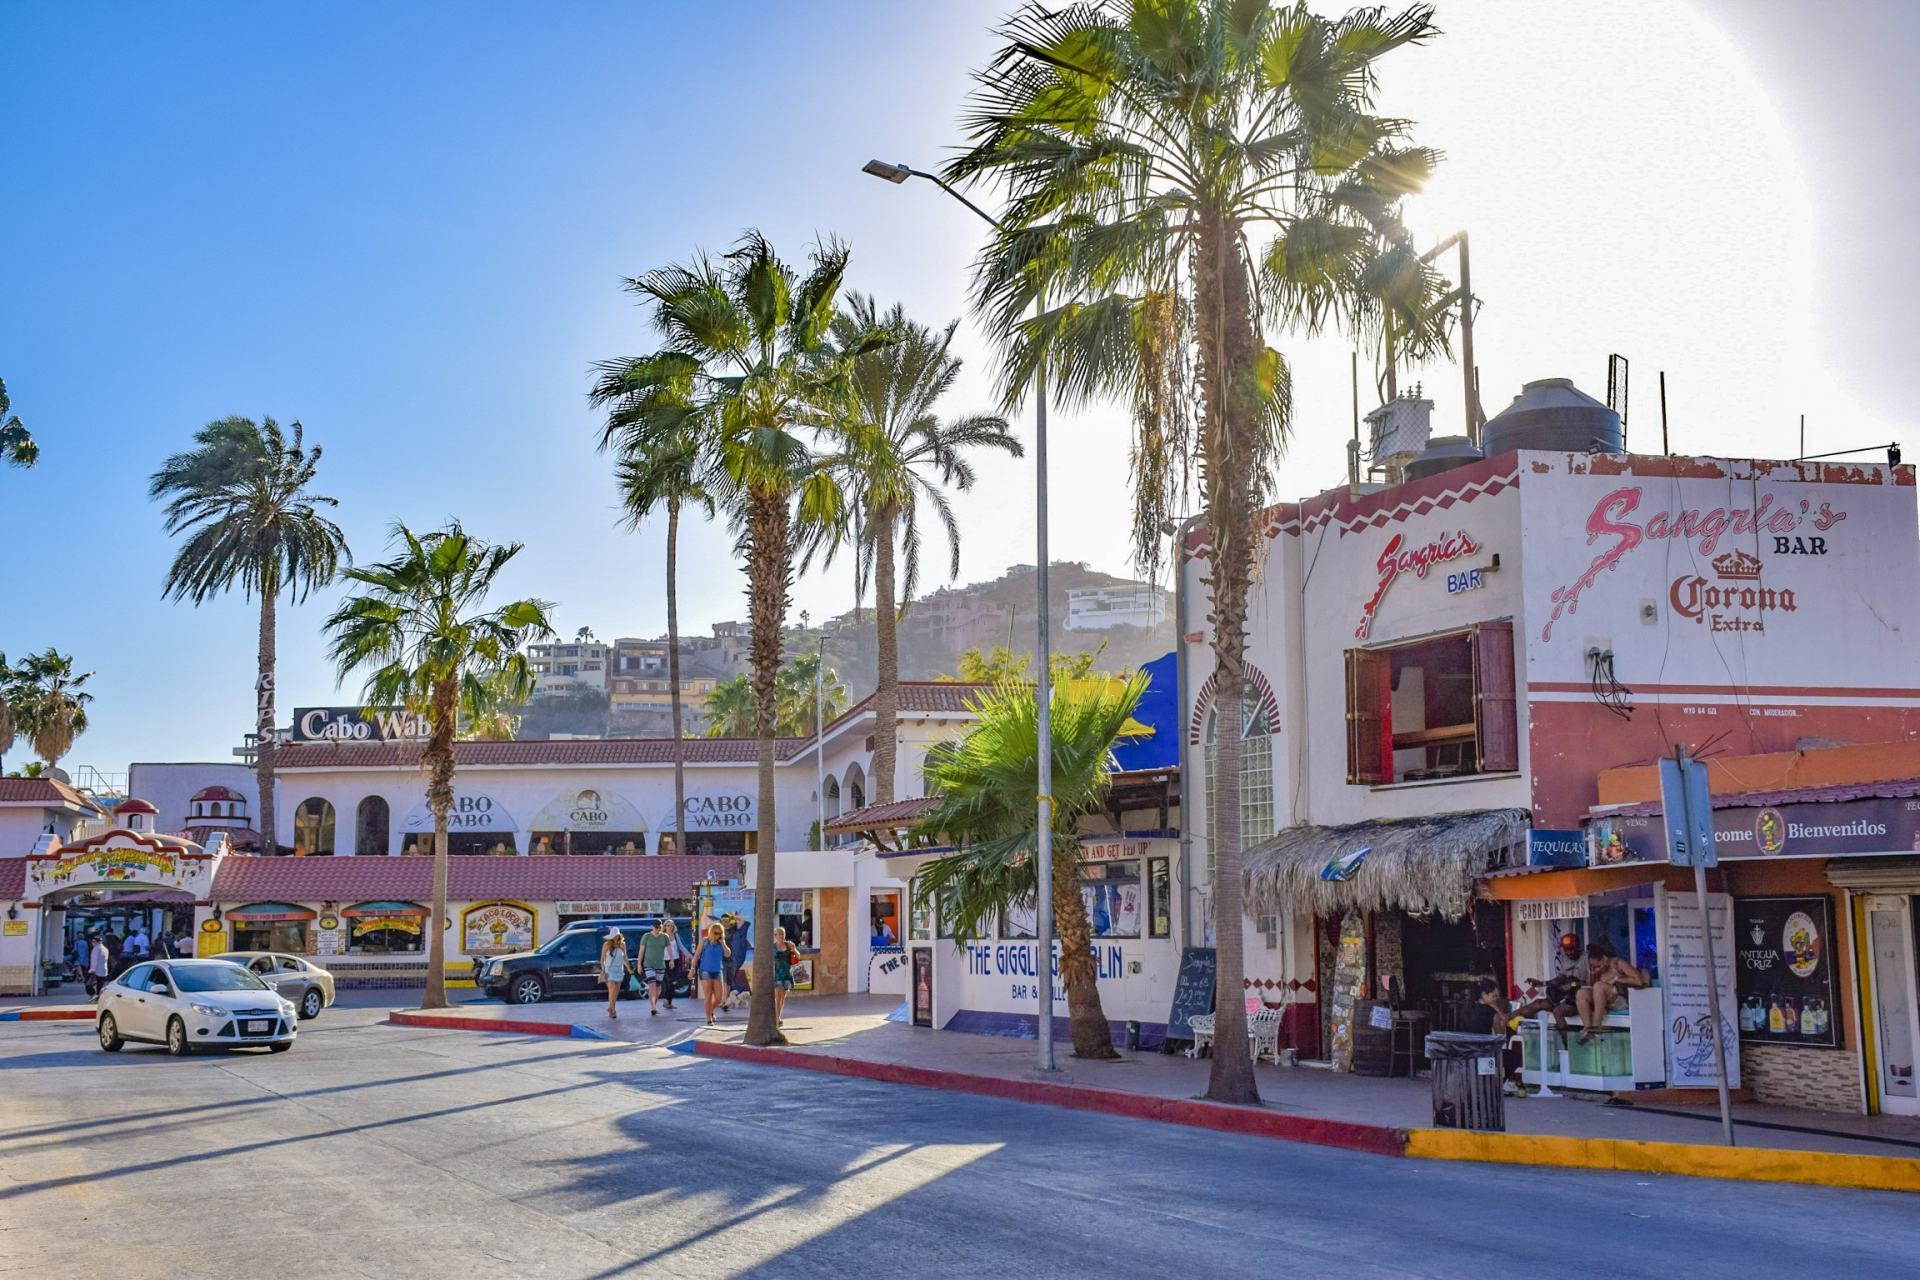 town of cabo san lucas